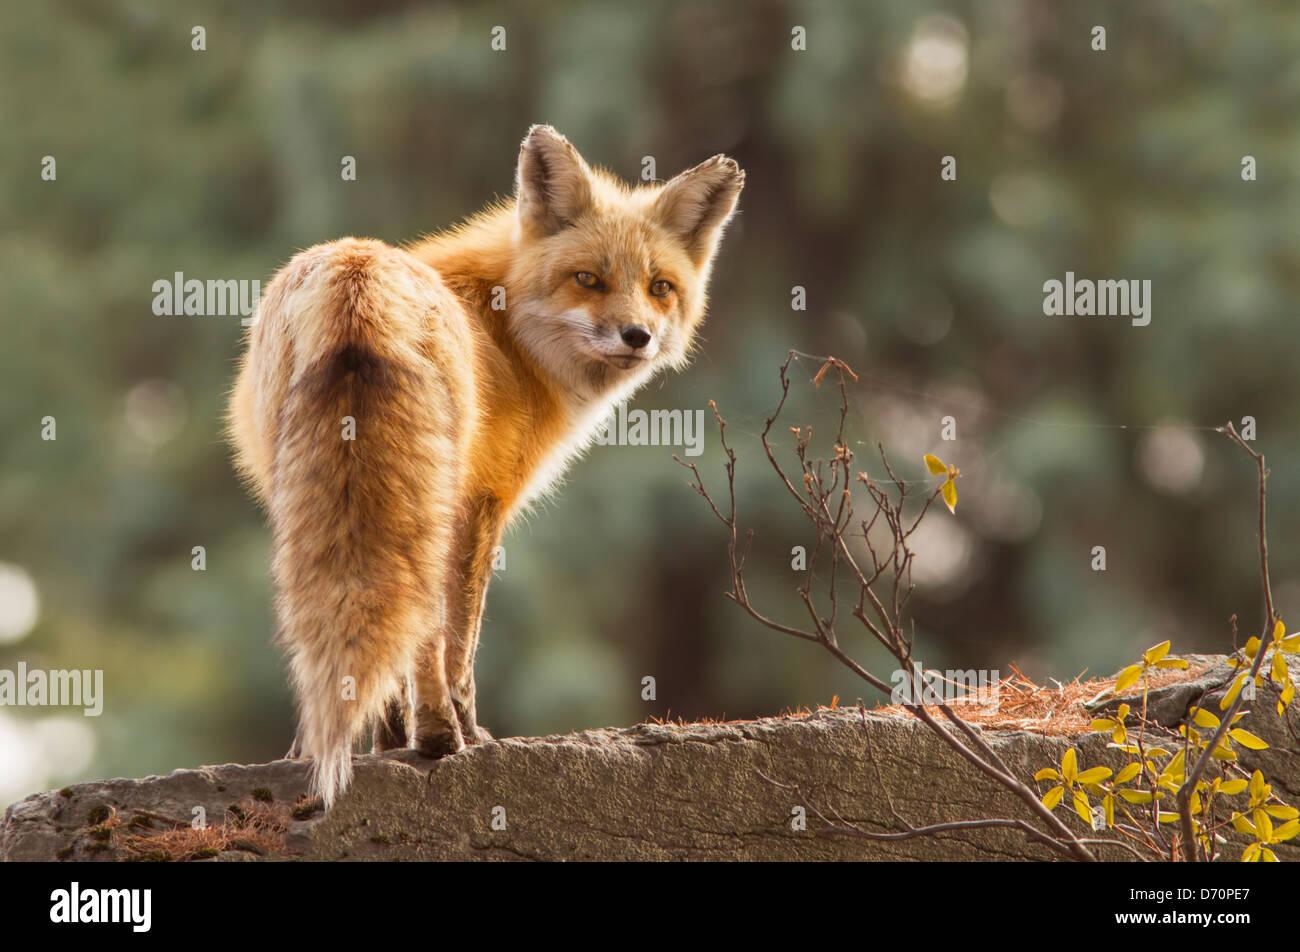 Female red fox in the morning light - Stock Image